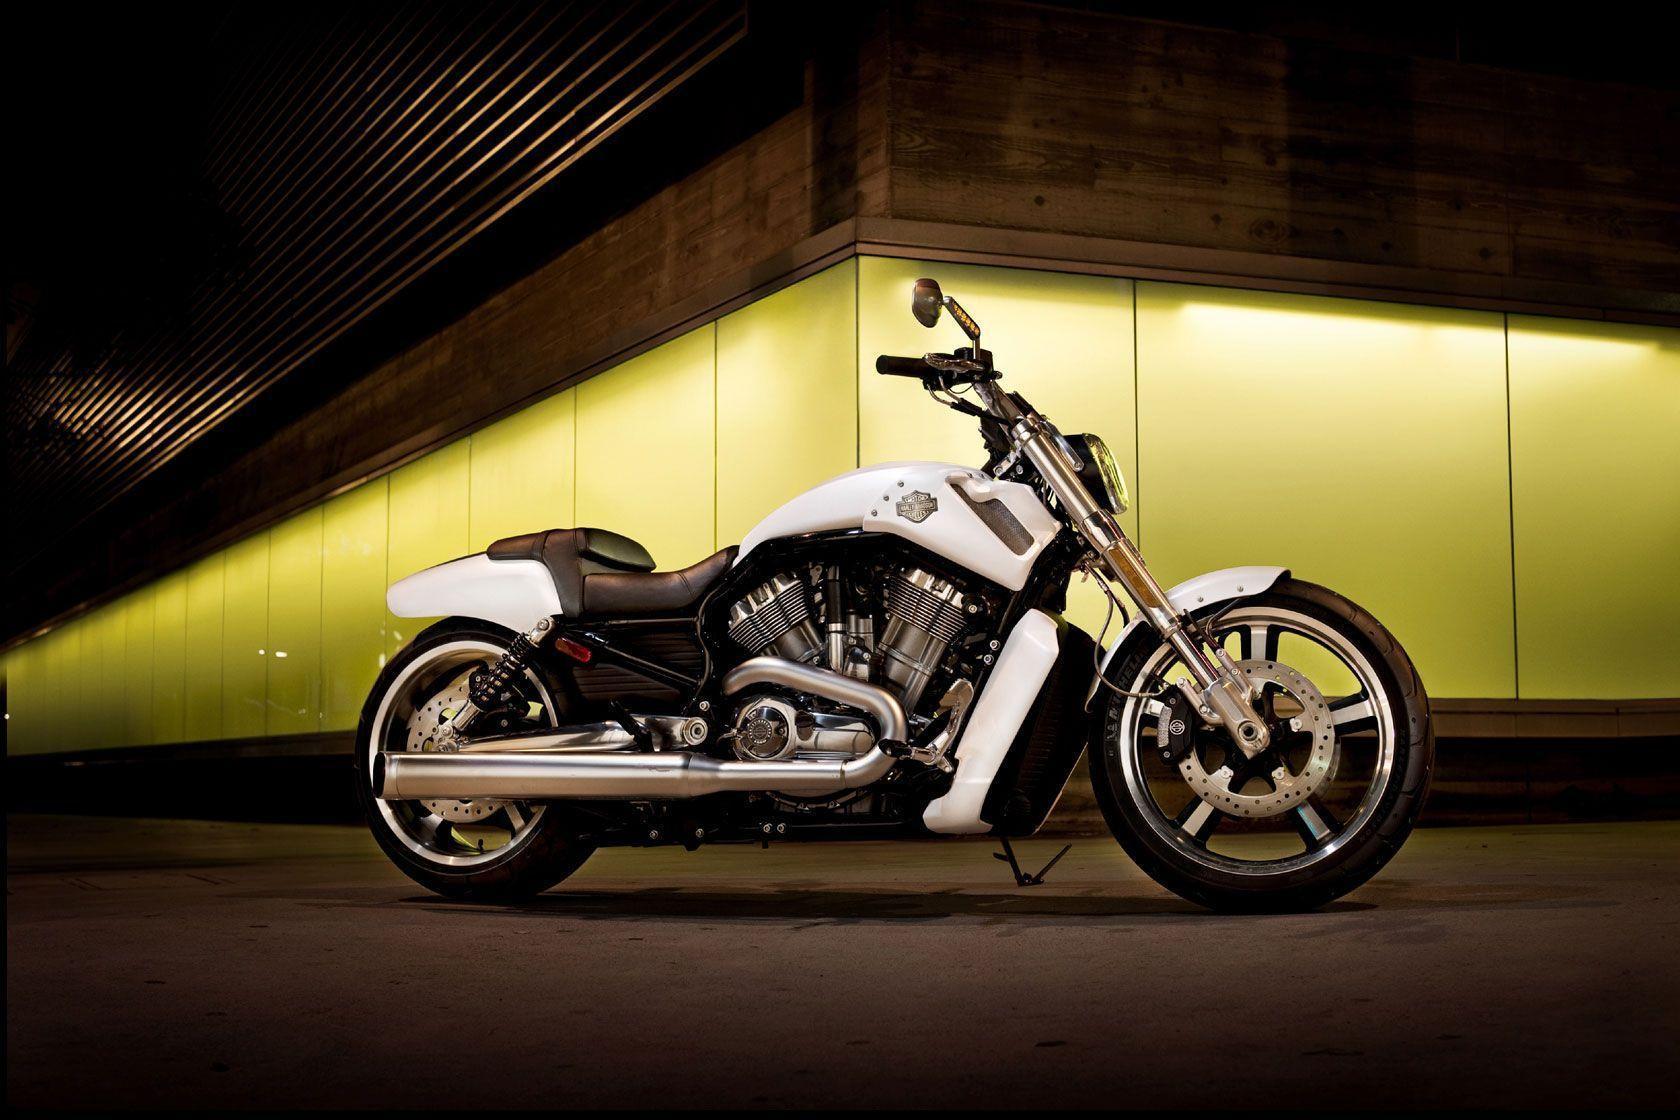 Harley Davidson V Rod Muscle Wallpapers 1680x1120